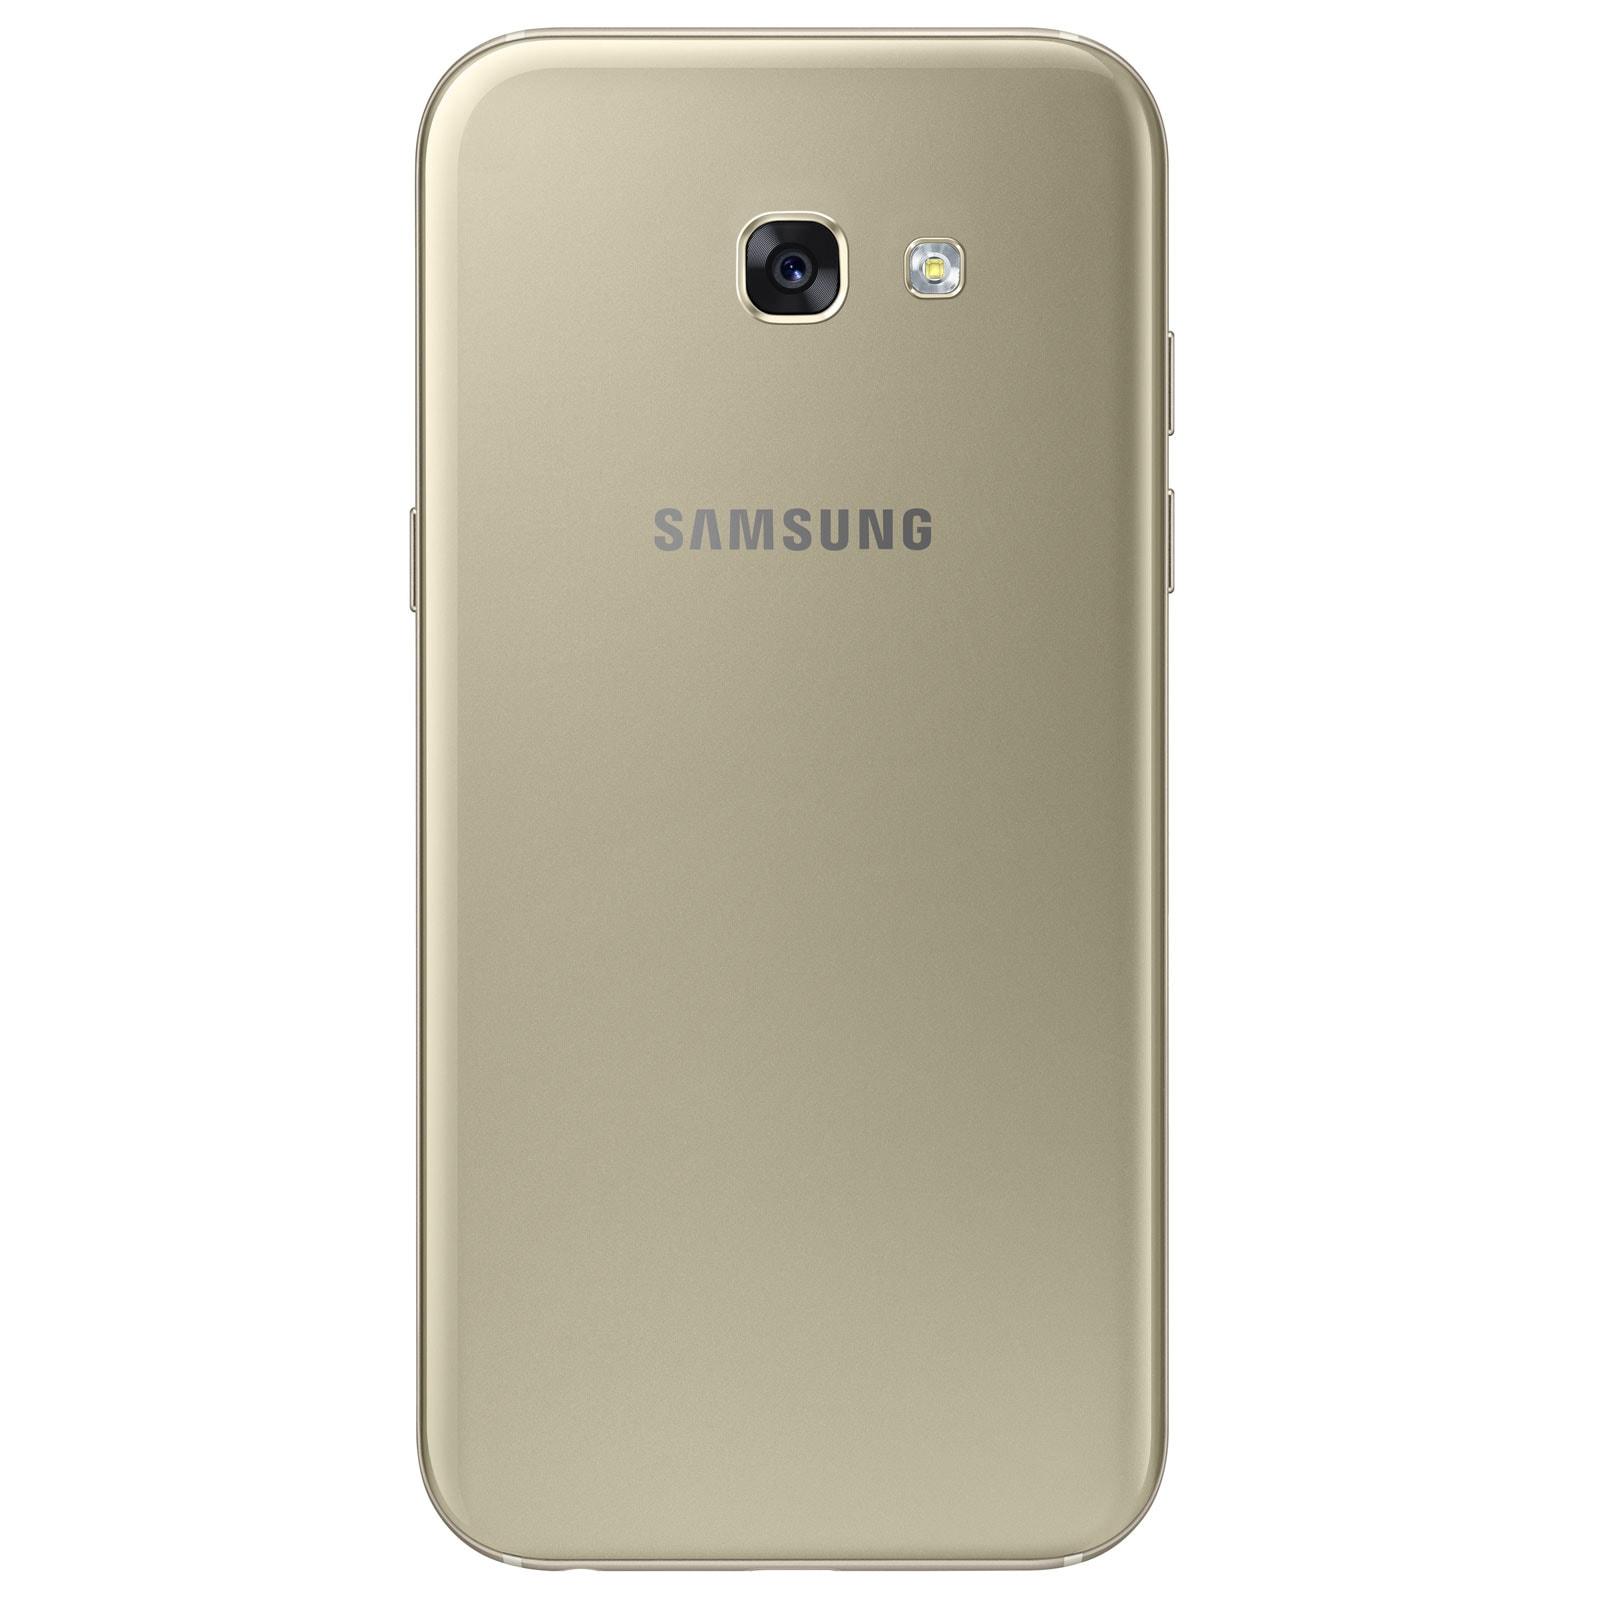 Samsung Galaxy A3 (2017) Or - Téléphonie Samsung - Cybertek.fr - 1